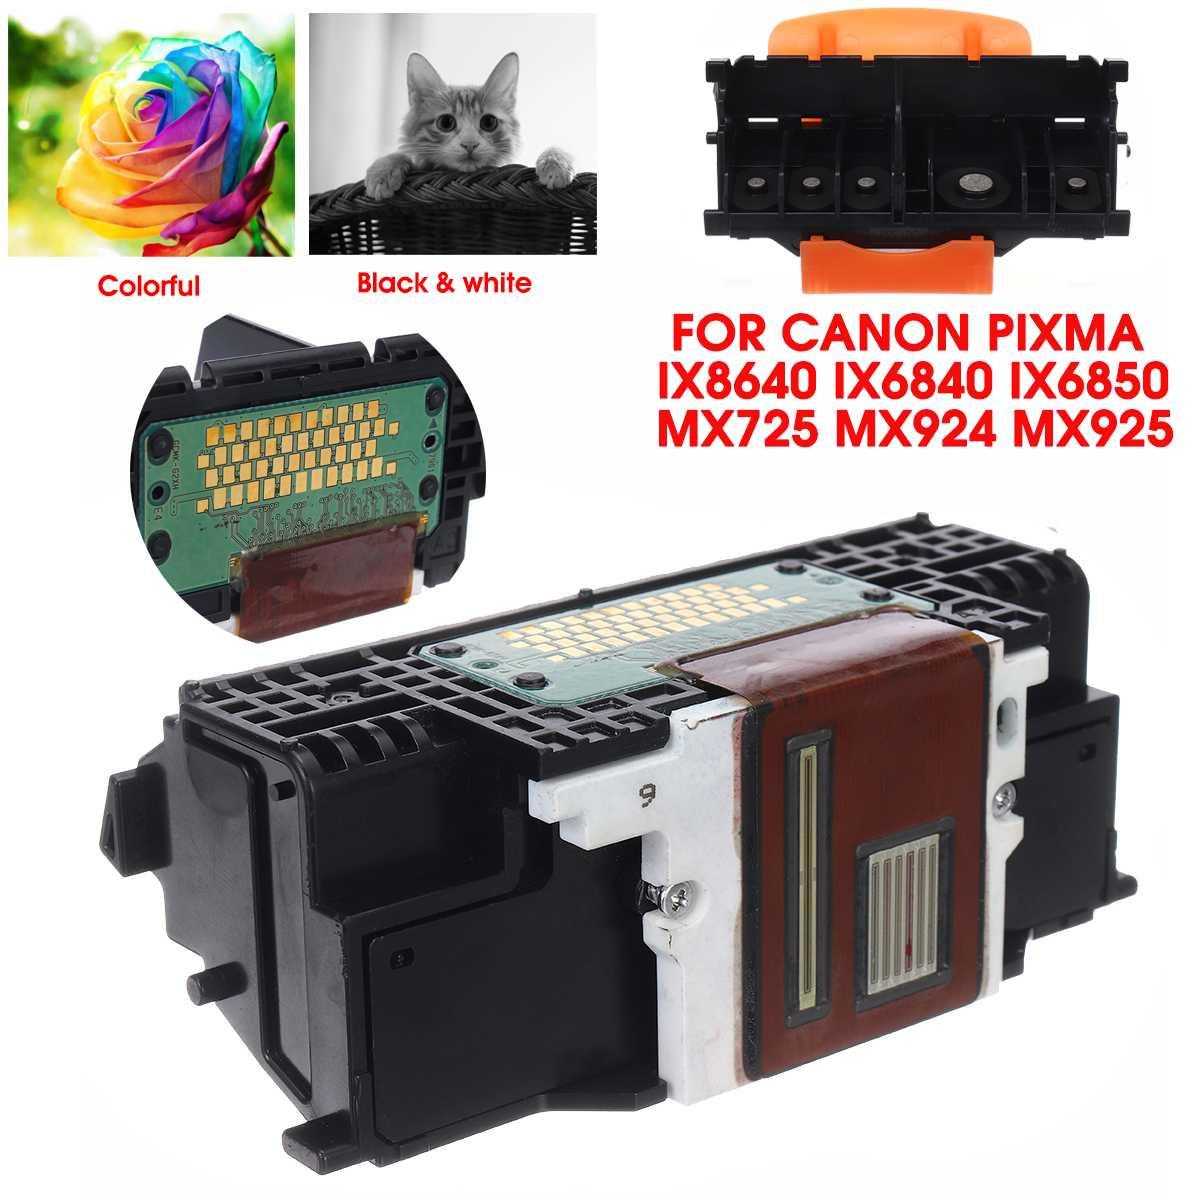 Cabezal de impresión LEORY QY6-0086-000 accesorios de piezas de impresora para Canon Pixma iX8640 iX6840 iX6850 MX725 MX924 MX925